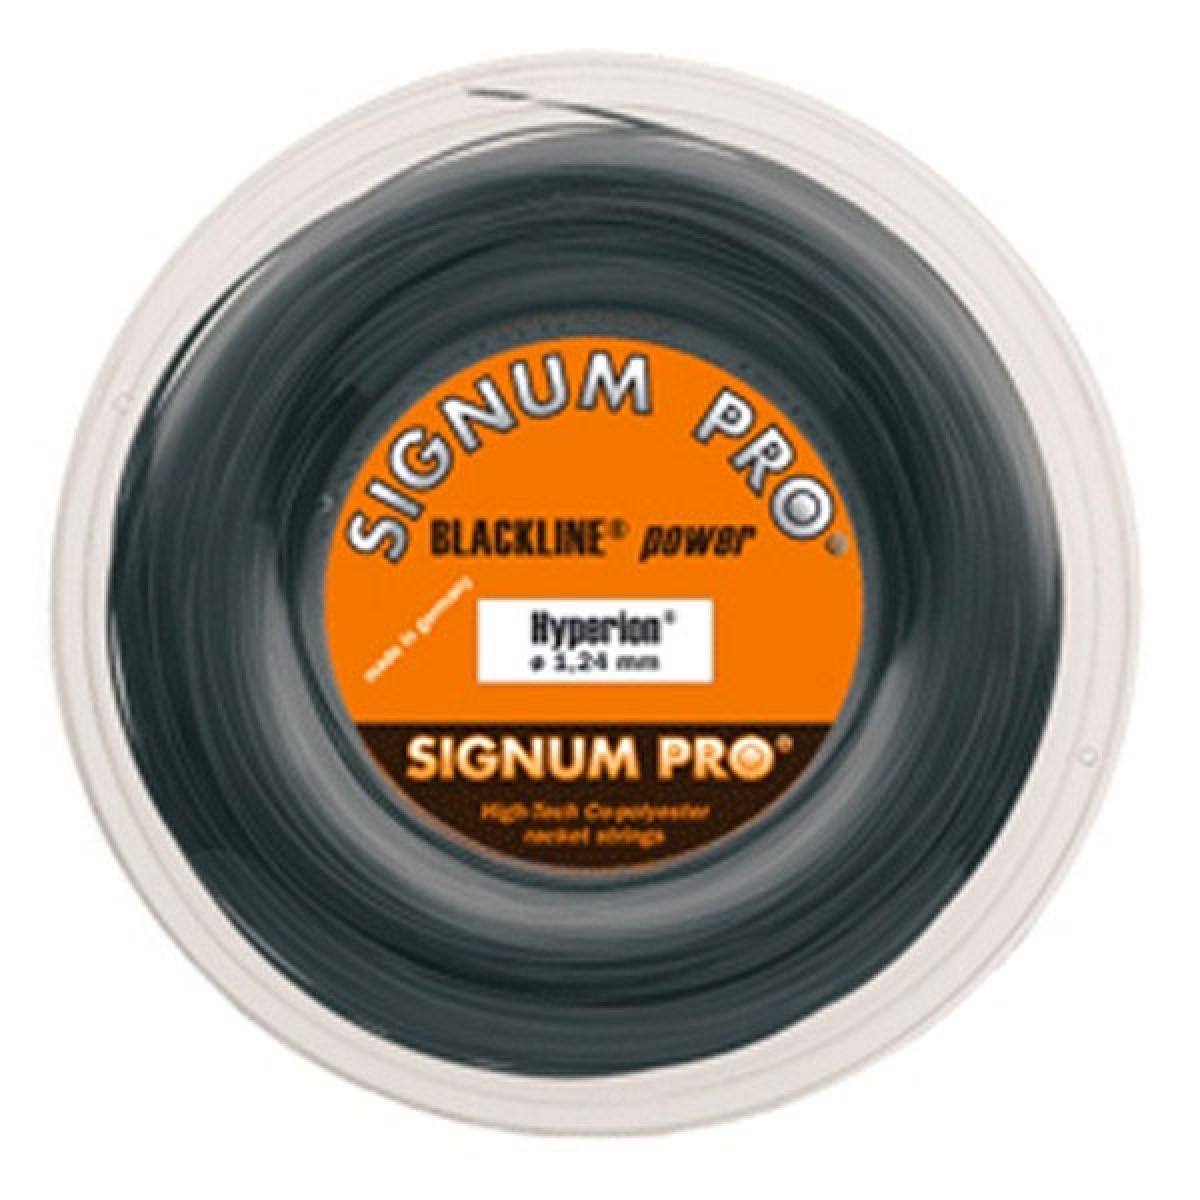 BOBINE SIGNUM PRO HYPERION (200 METRES)